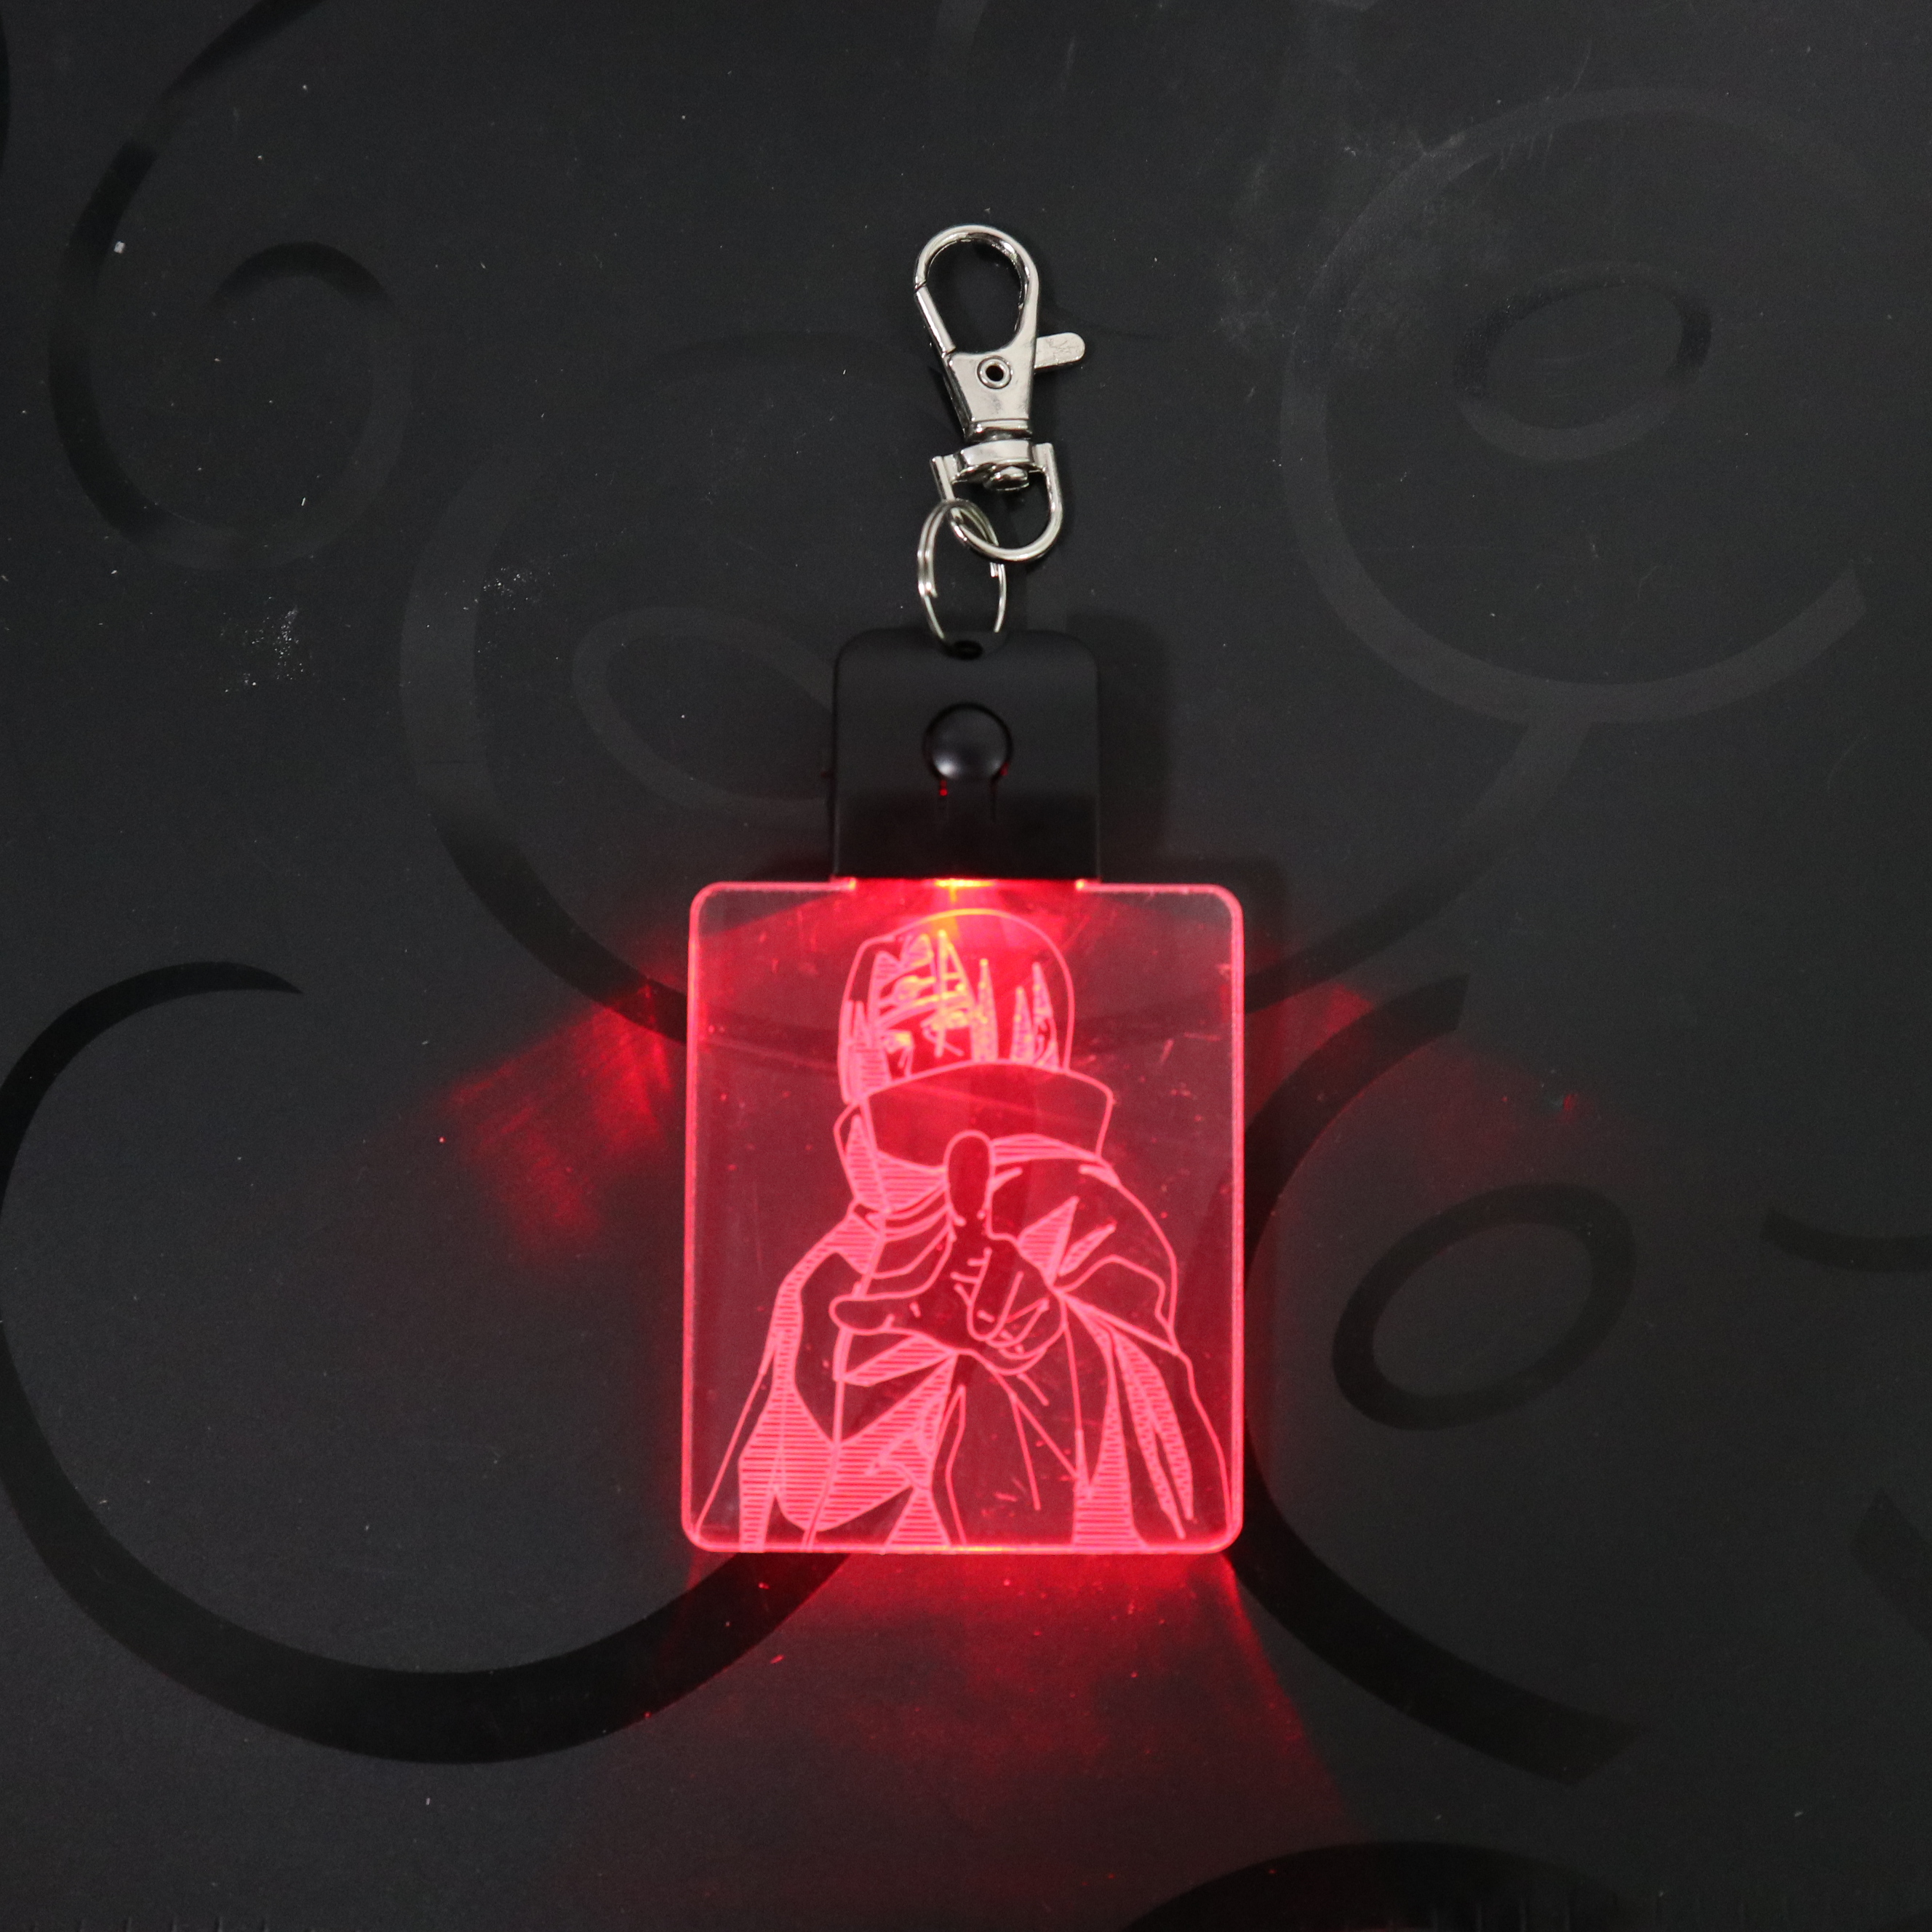 Naruto Figure Cartoon Keychain 3D LED Arylic Night Light Magical Decor Lamp Lighting Colors Decoration Back To School Gift